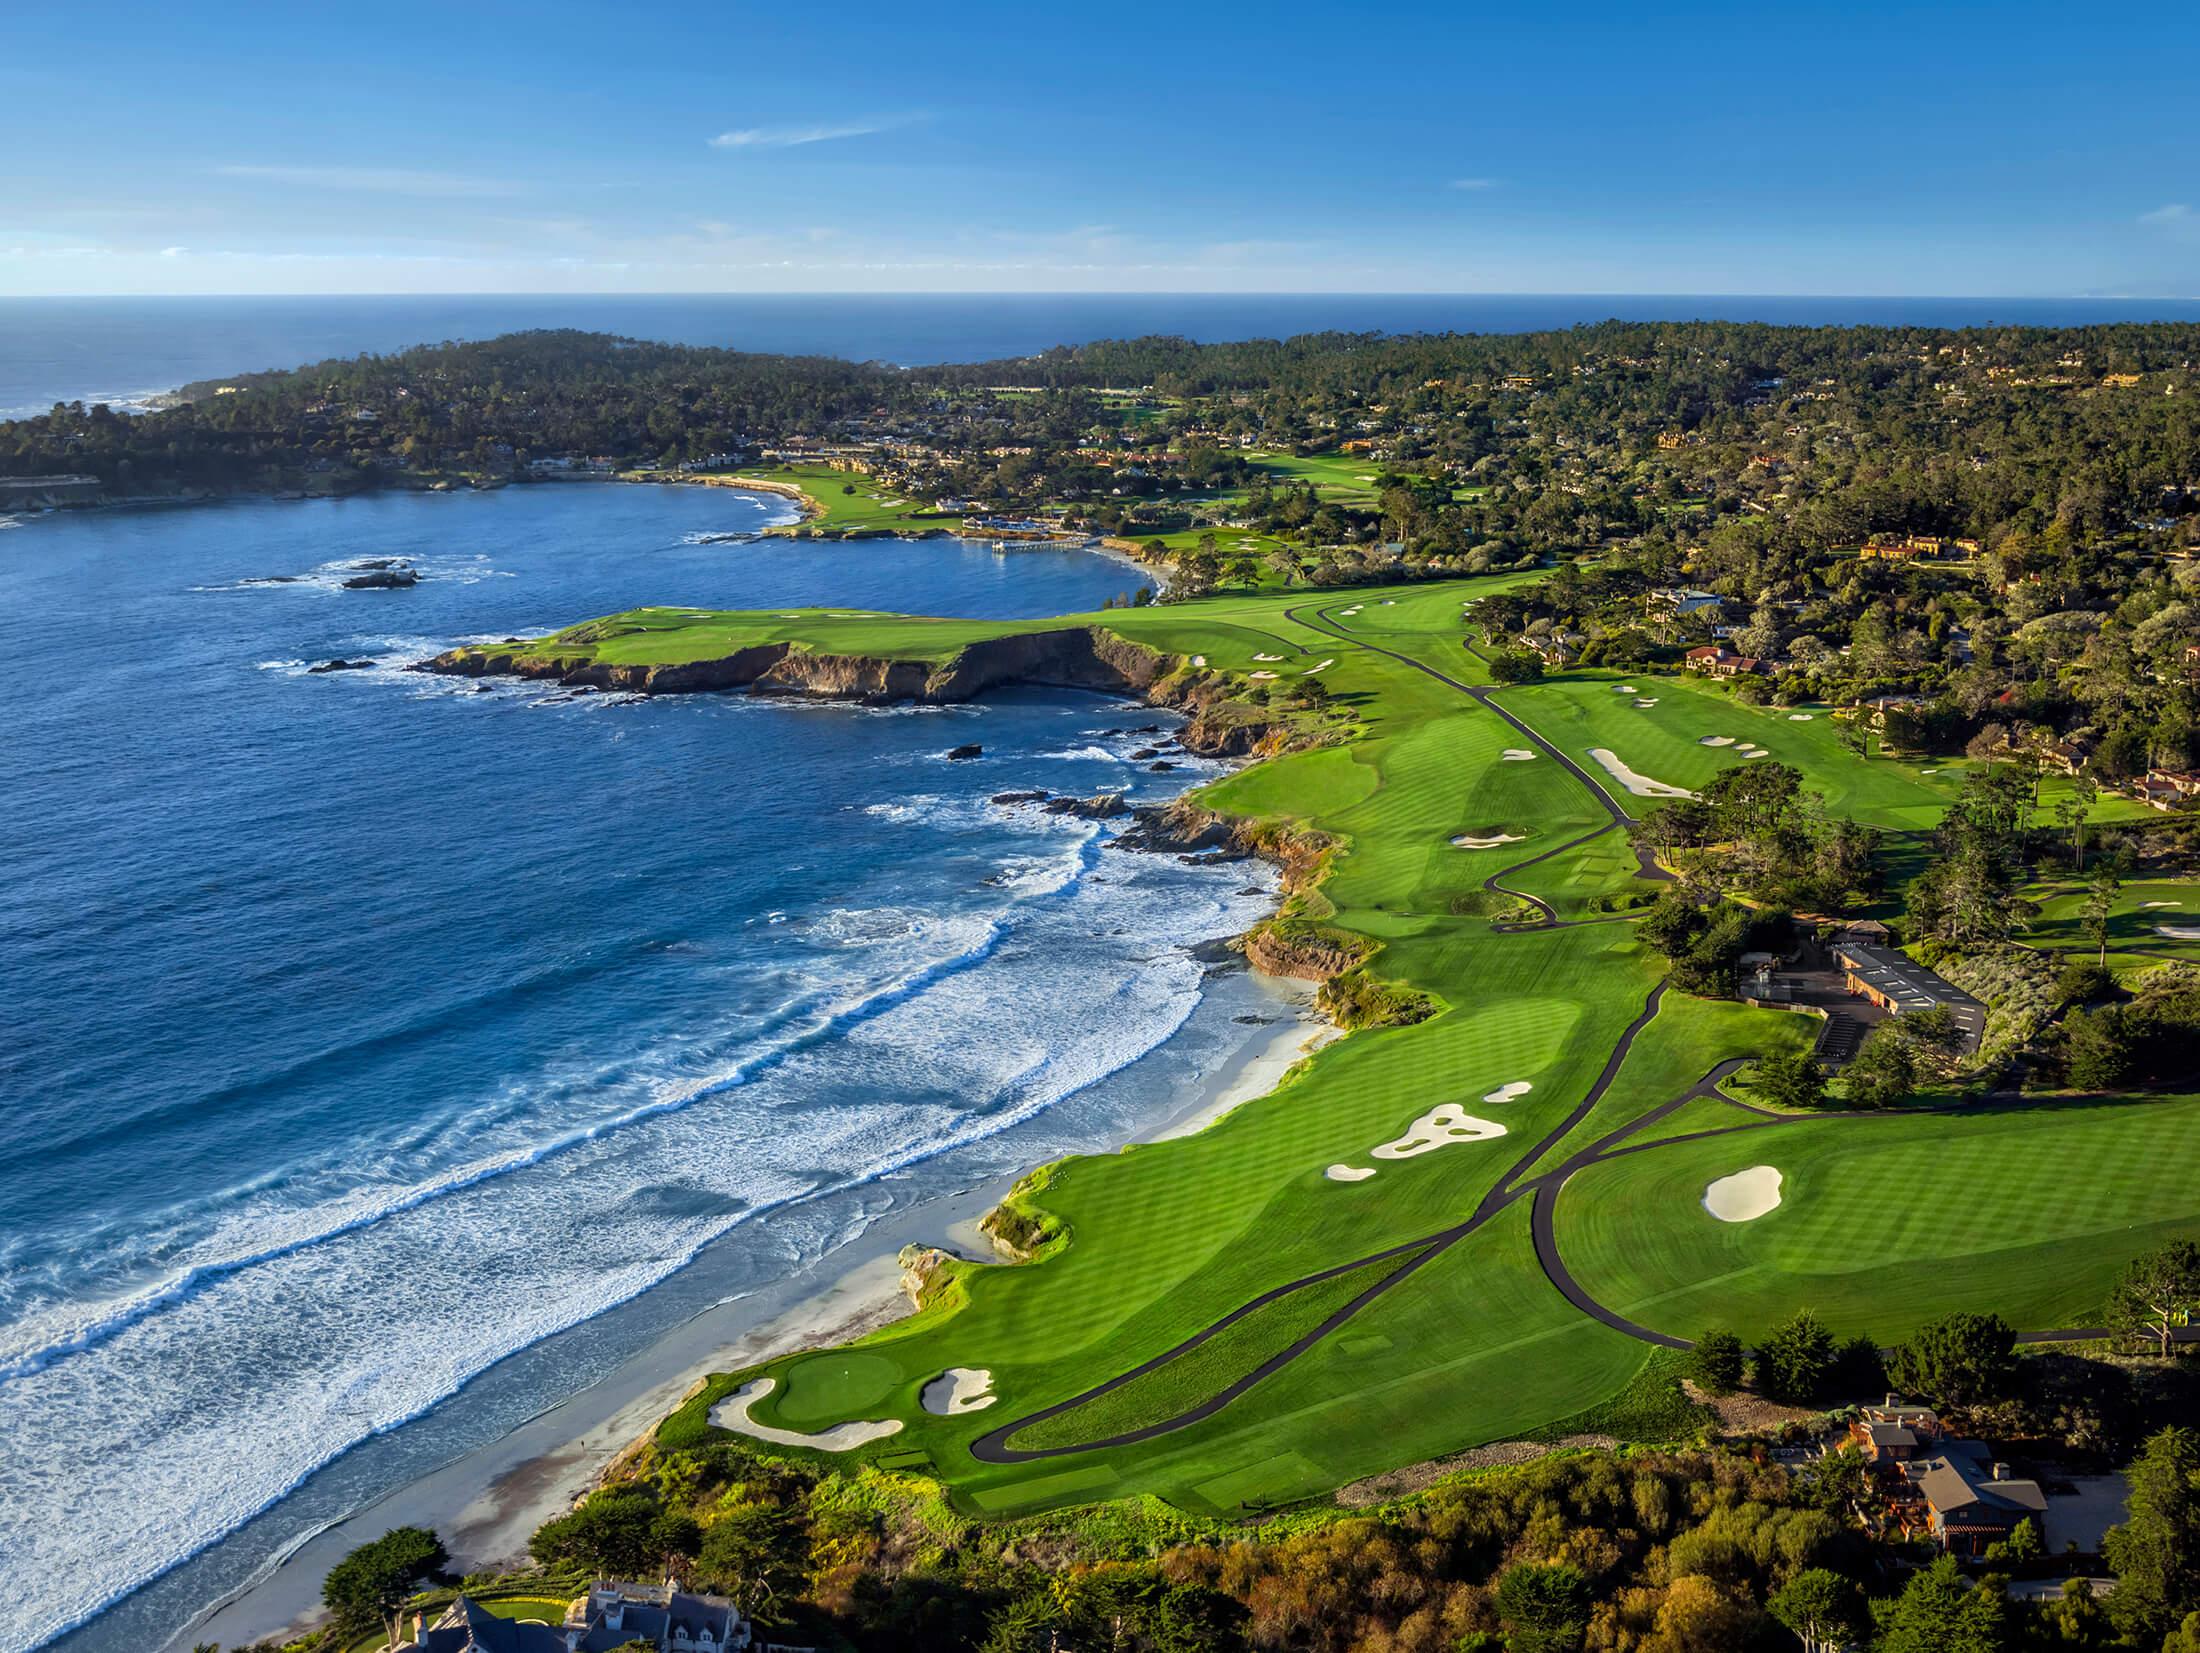 Pebble Beach Golf Links - California, USA - Voyages.golf